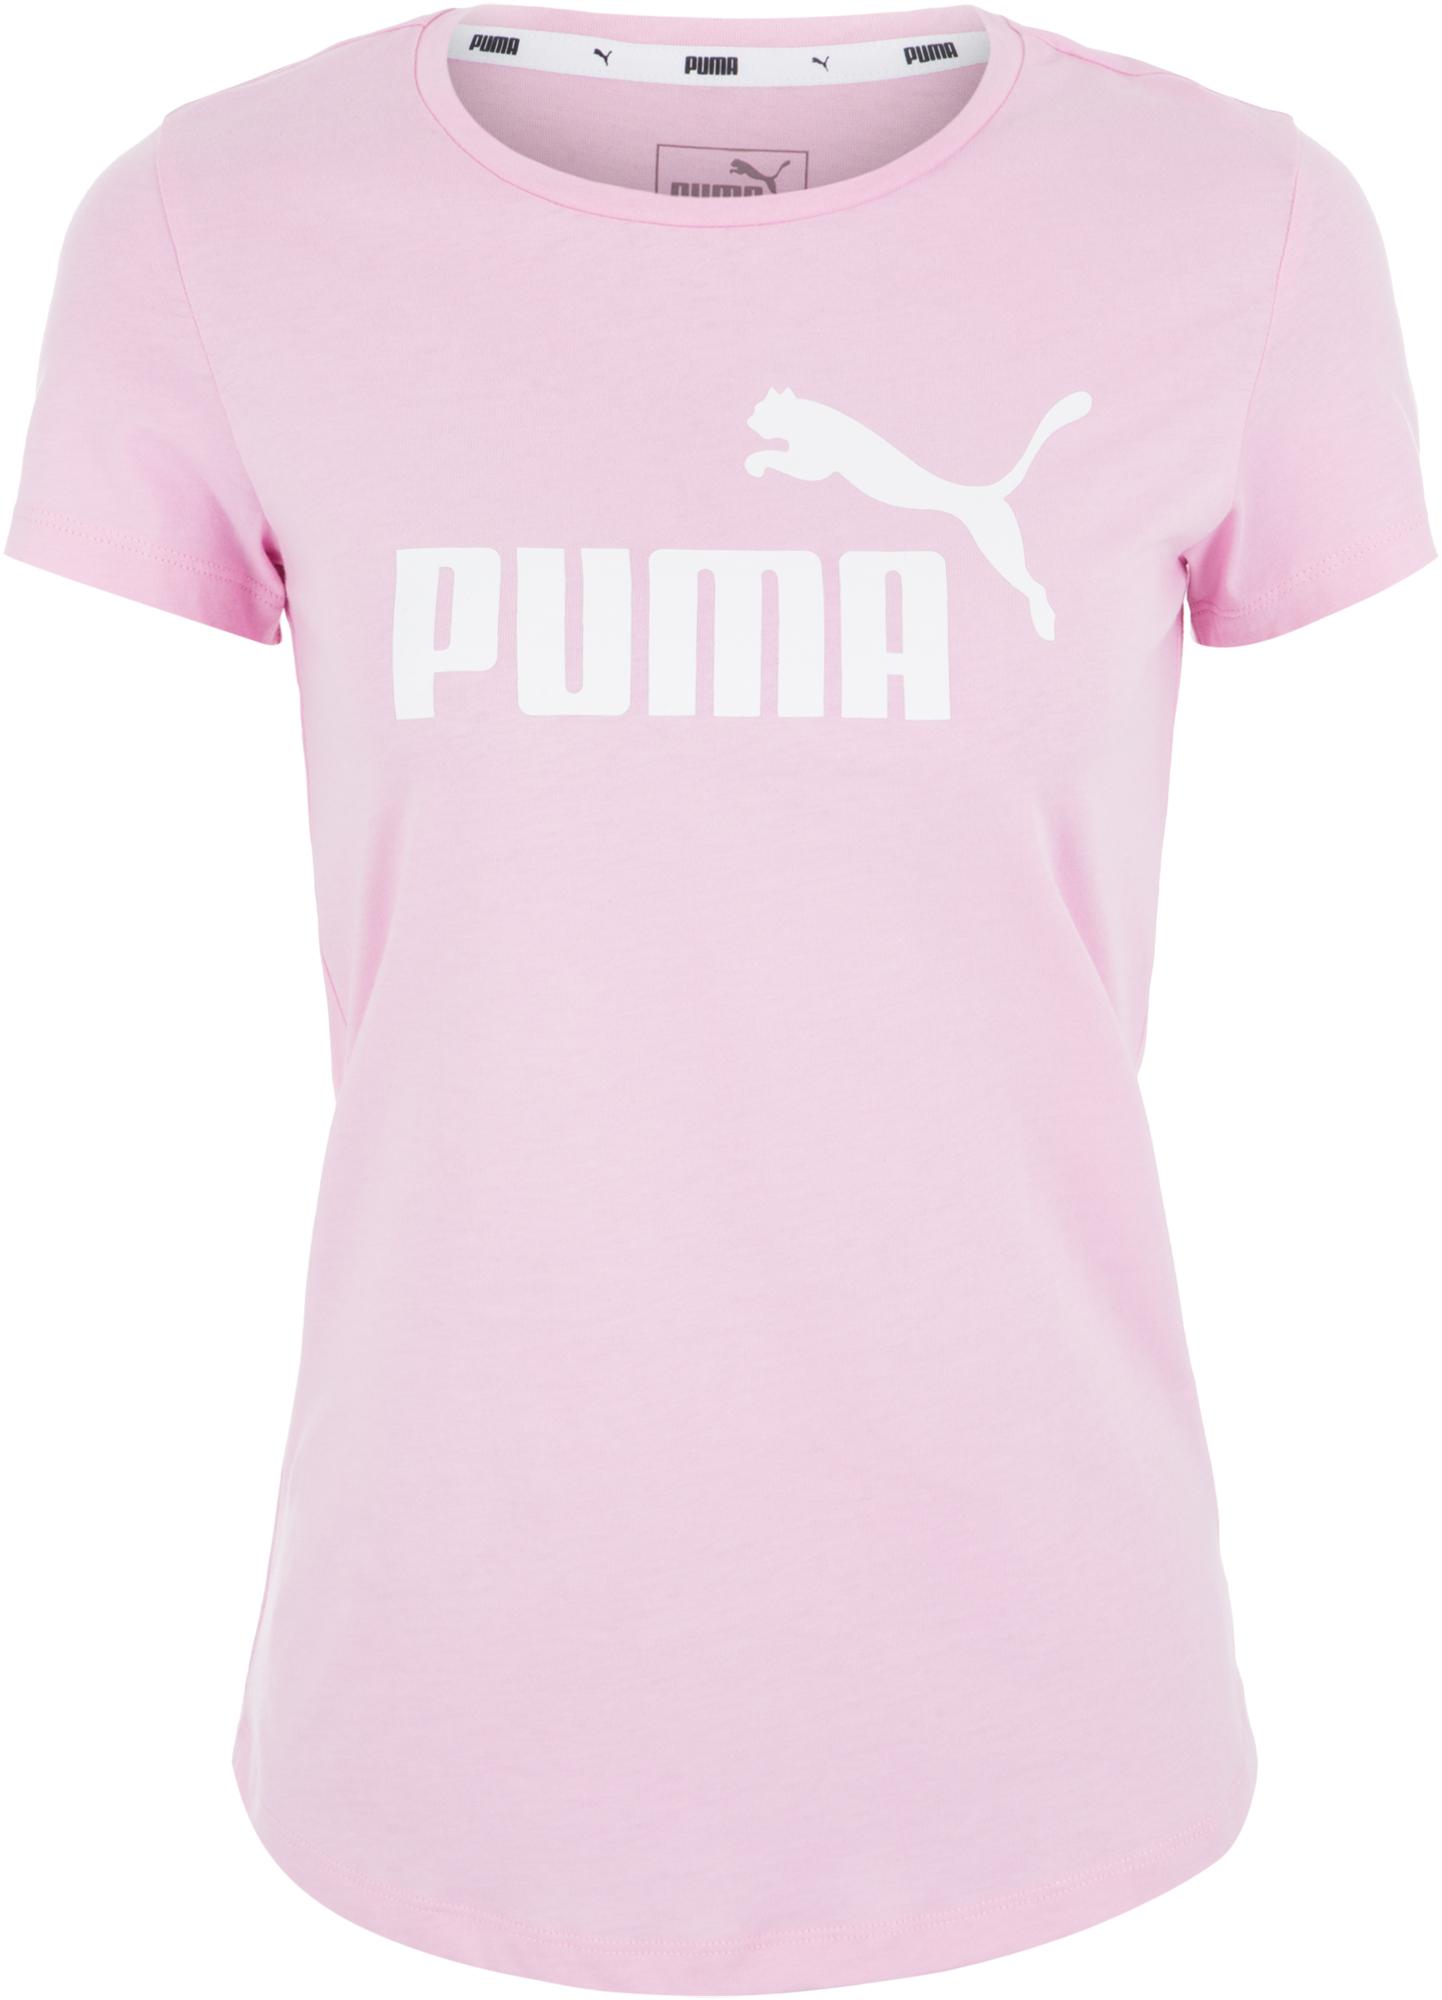 Puma Футболка женская Puma ESS Logo, размер 48-50